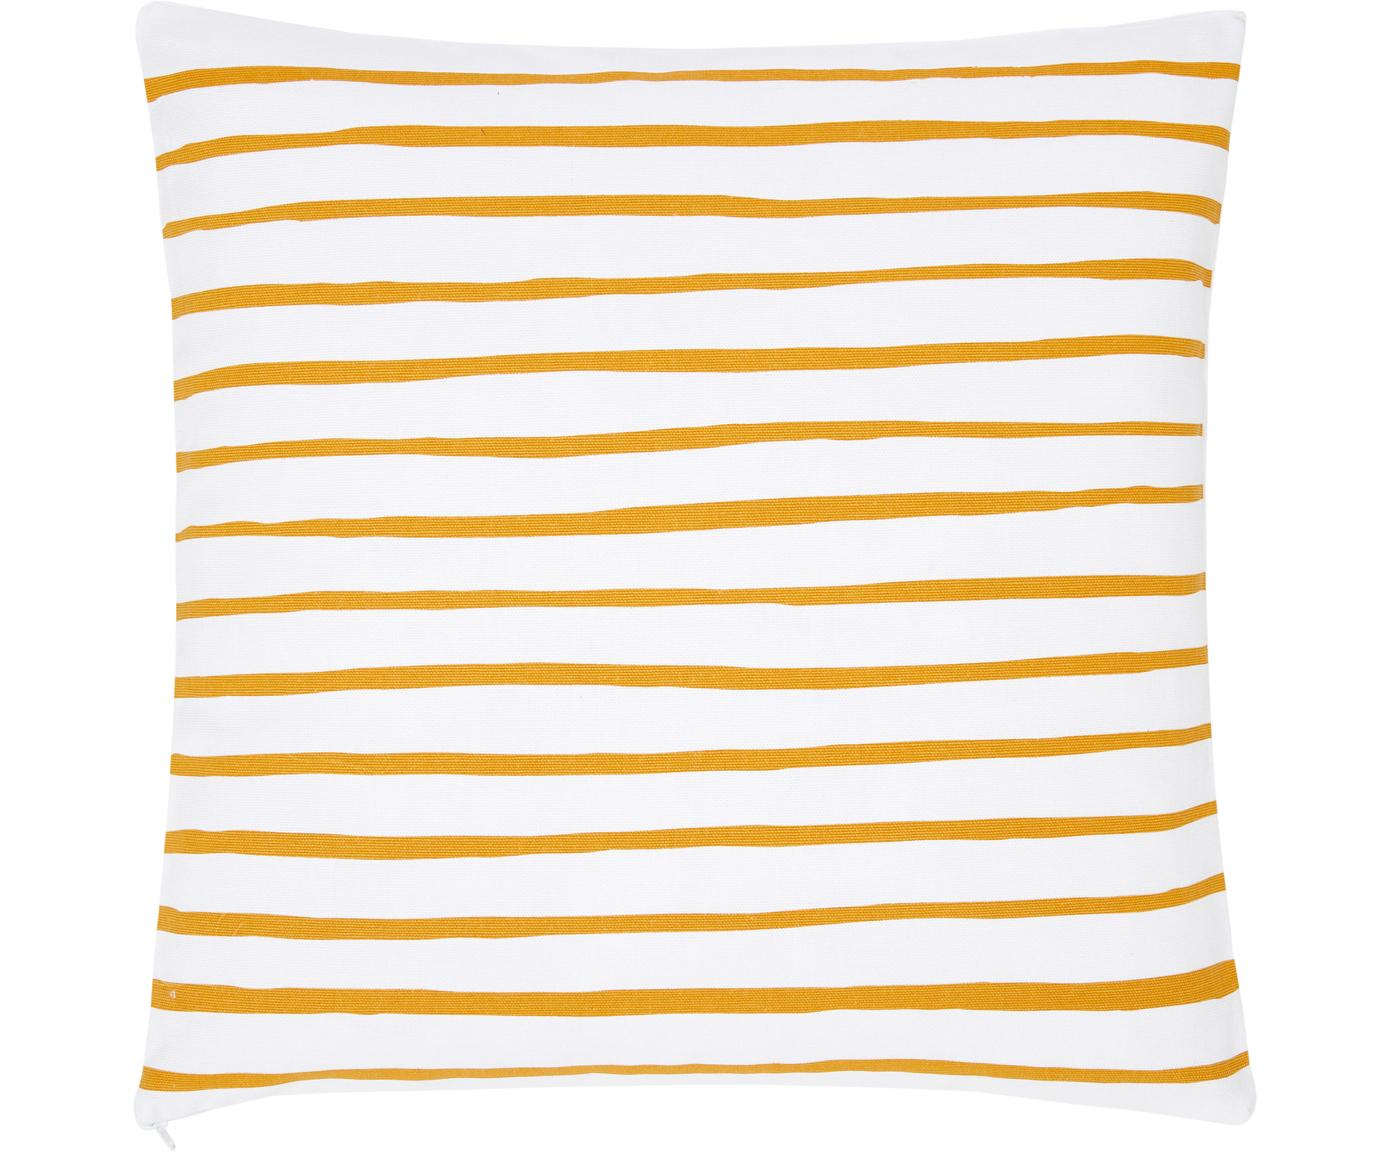 Gestreifte Kissenhülle Ola, 100% Baumwolle, Gelb-Orange, Weiss, 40 x 40 cm